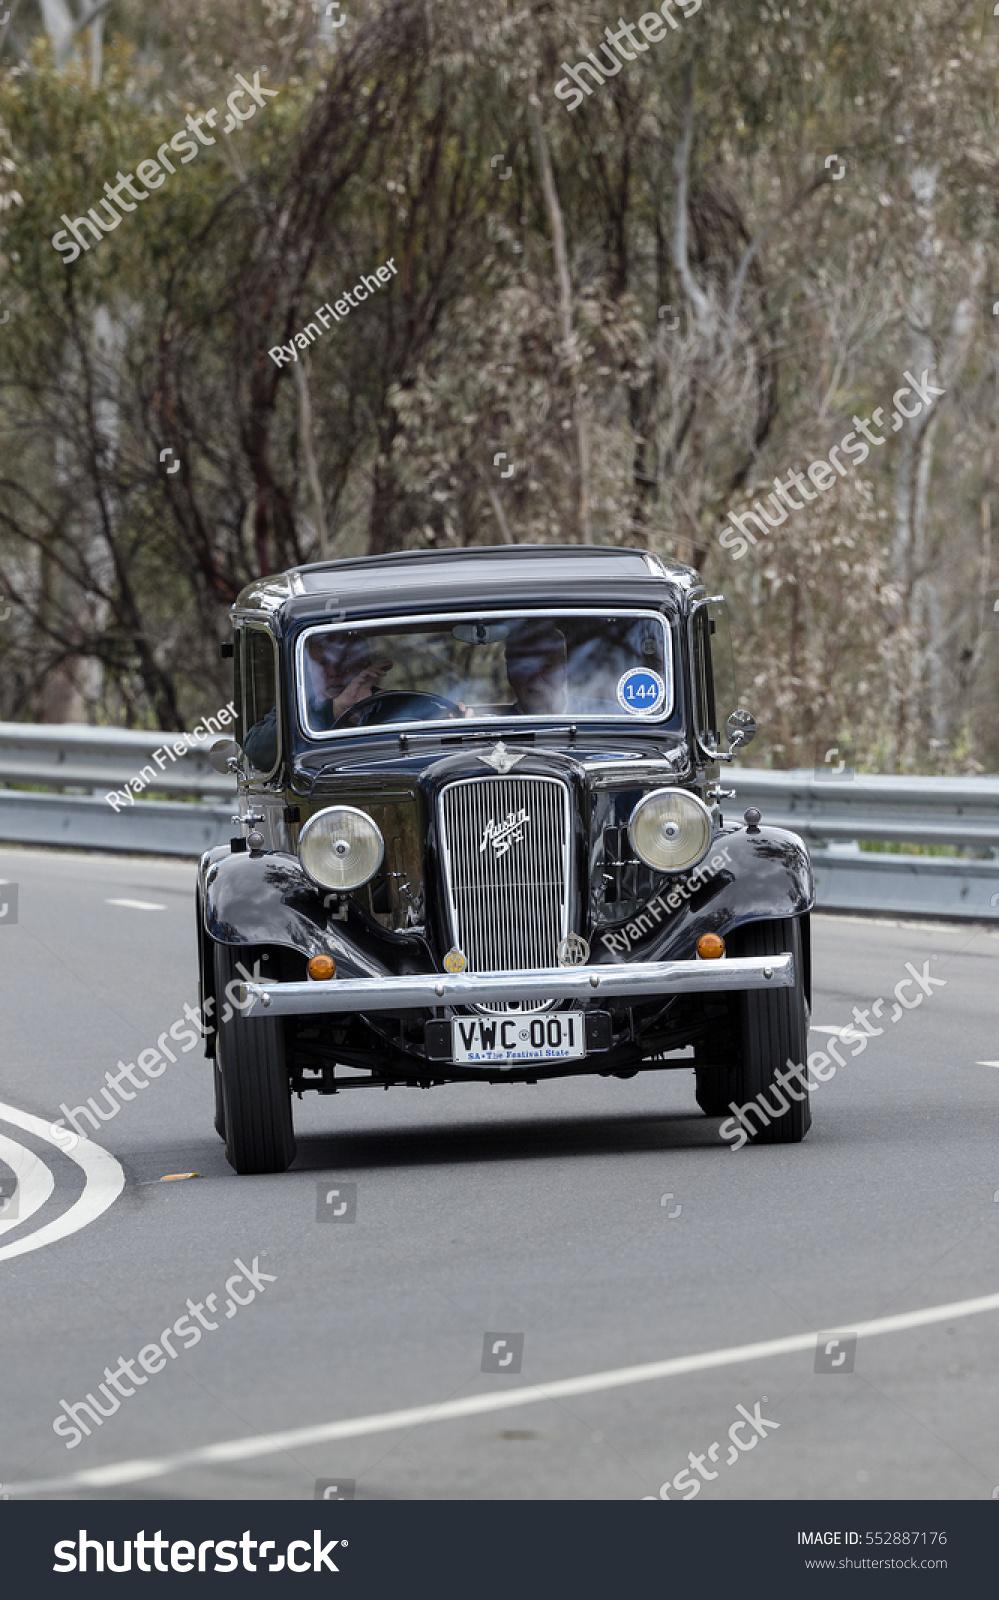 Adelaide Australia September 25 2016 Vintage Stock Photo 552887176 ...